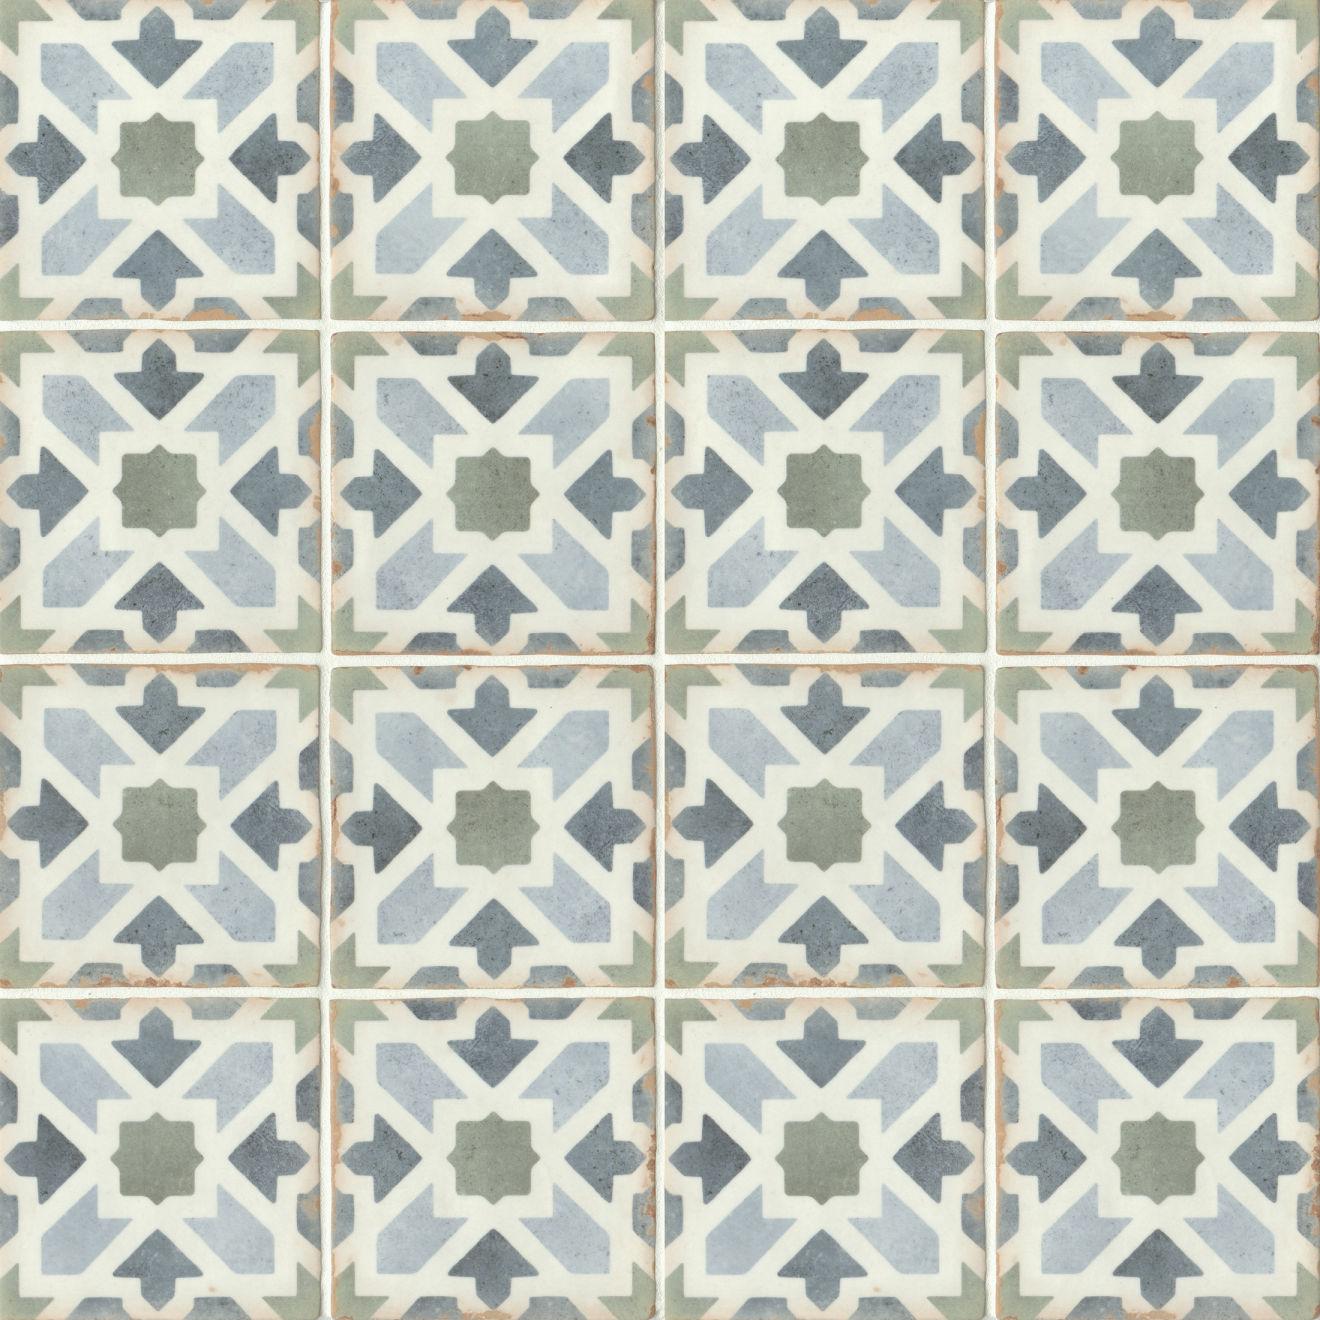 "Casablanca 5"" x 5"" Matte Ceramic Floor and Wall Tile in Kenzi"